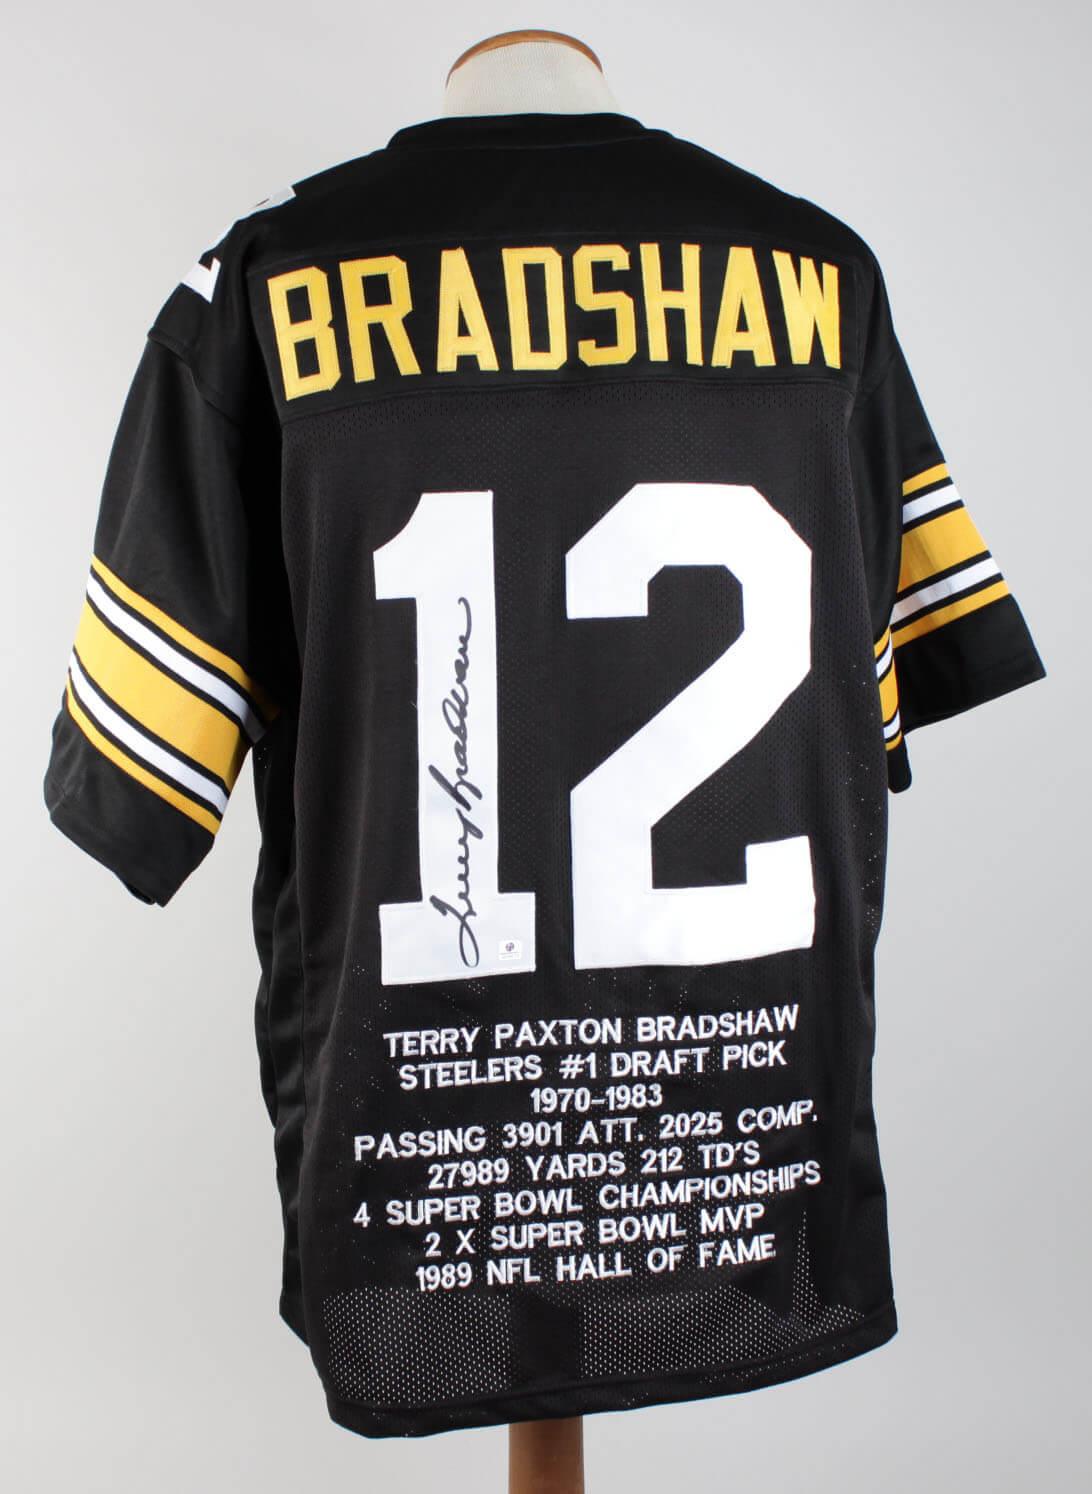 965cdb3f223 Steelers – Terry Bradshaw Autographed Black Jersey